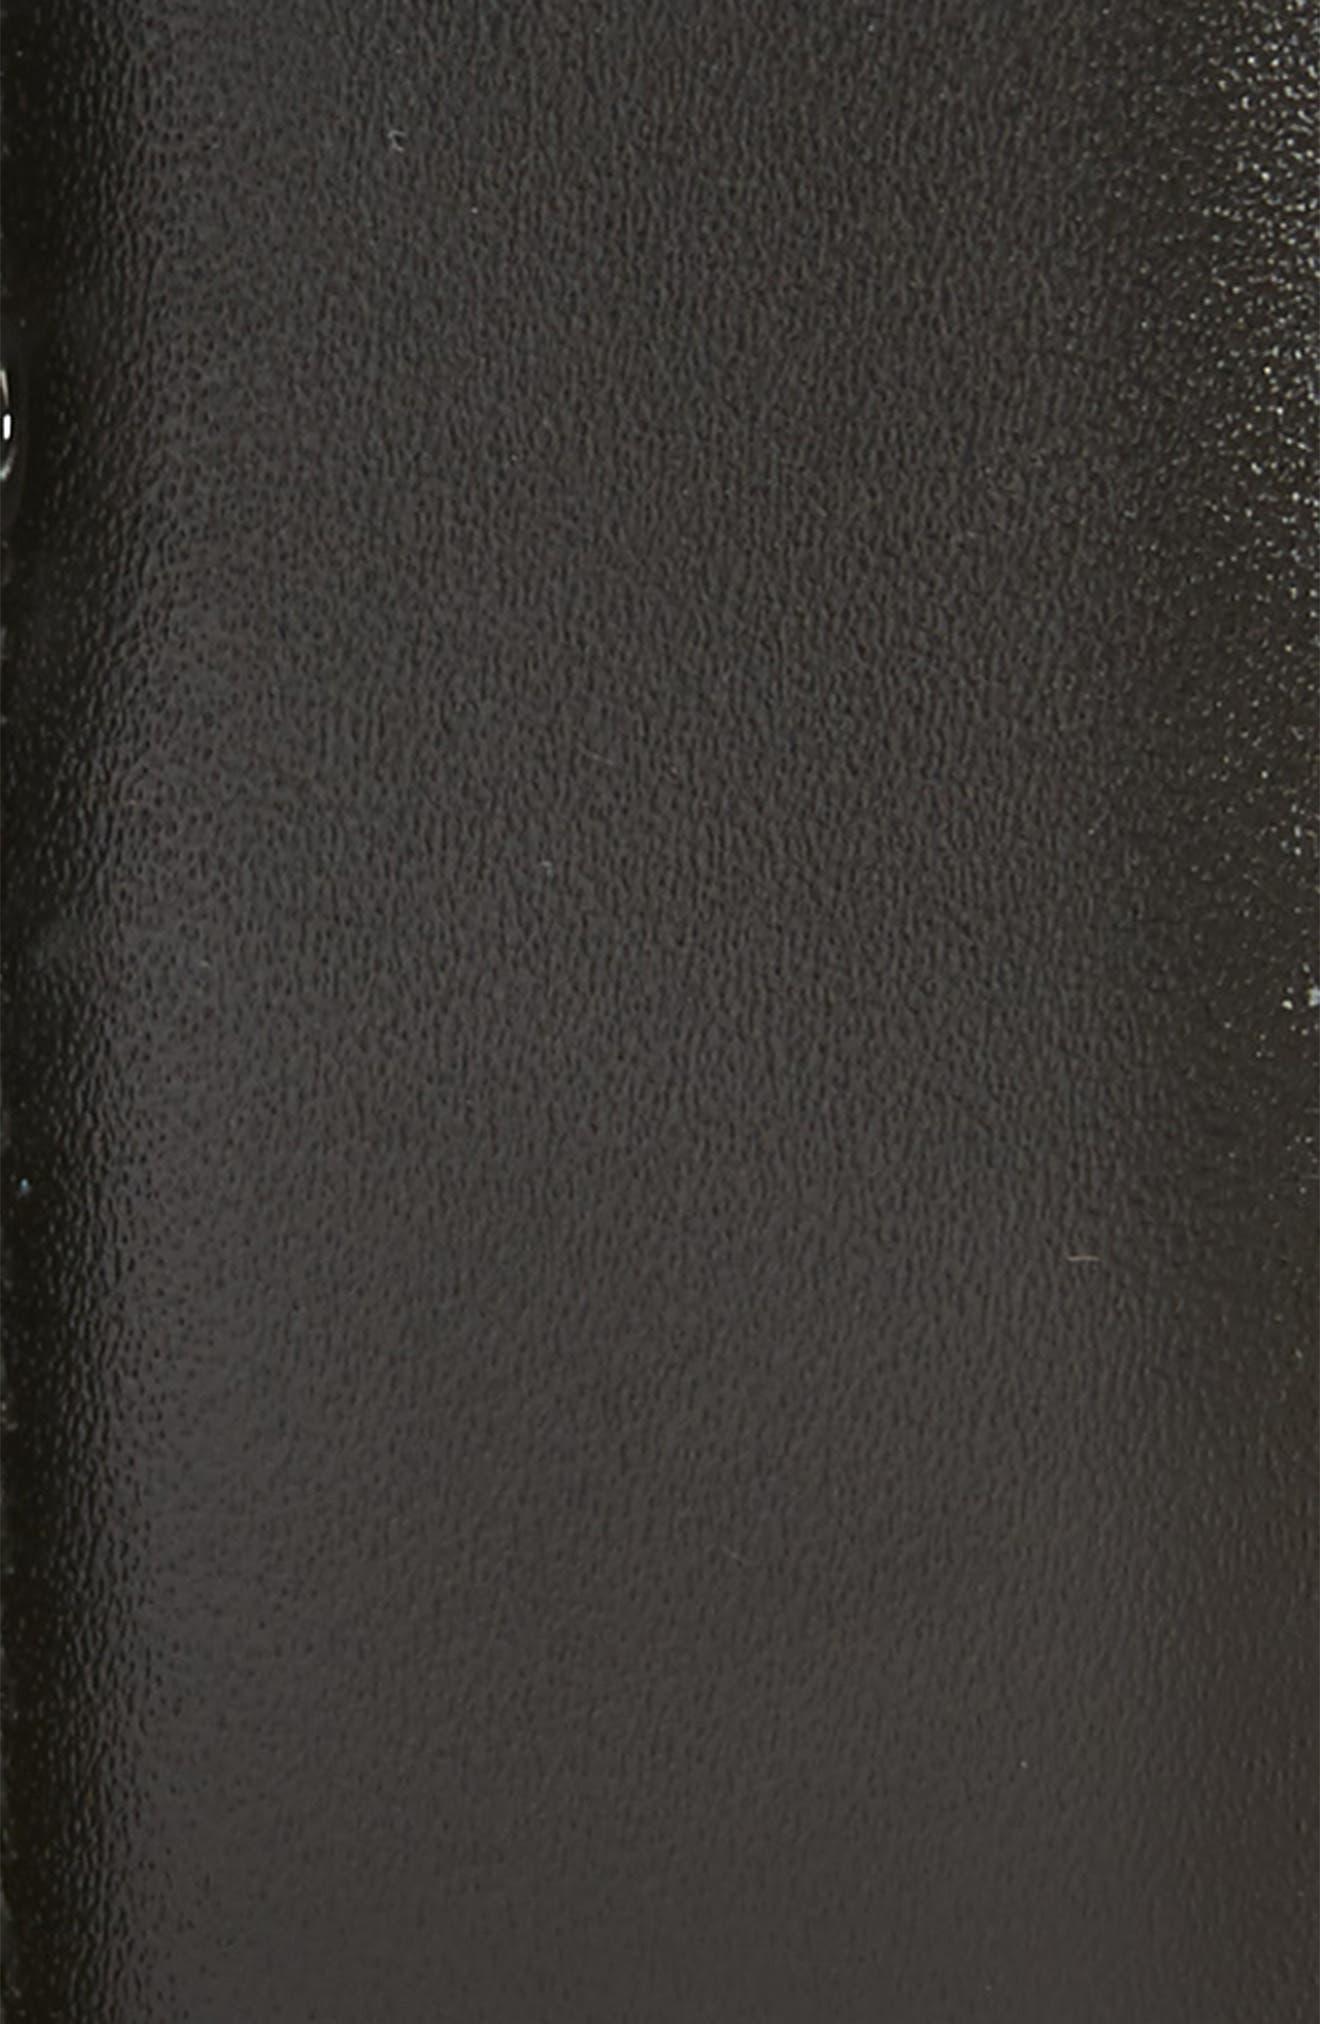 Reversible Leather Belt,                             Alternate thumbnail 3, color,                             BLACK/ AUBURN